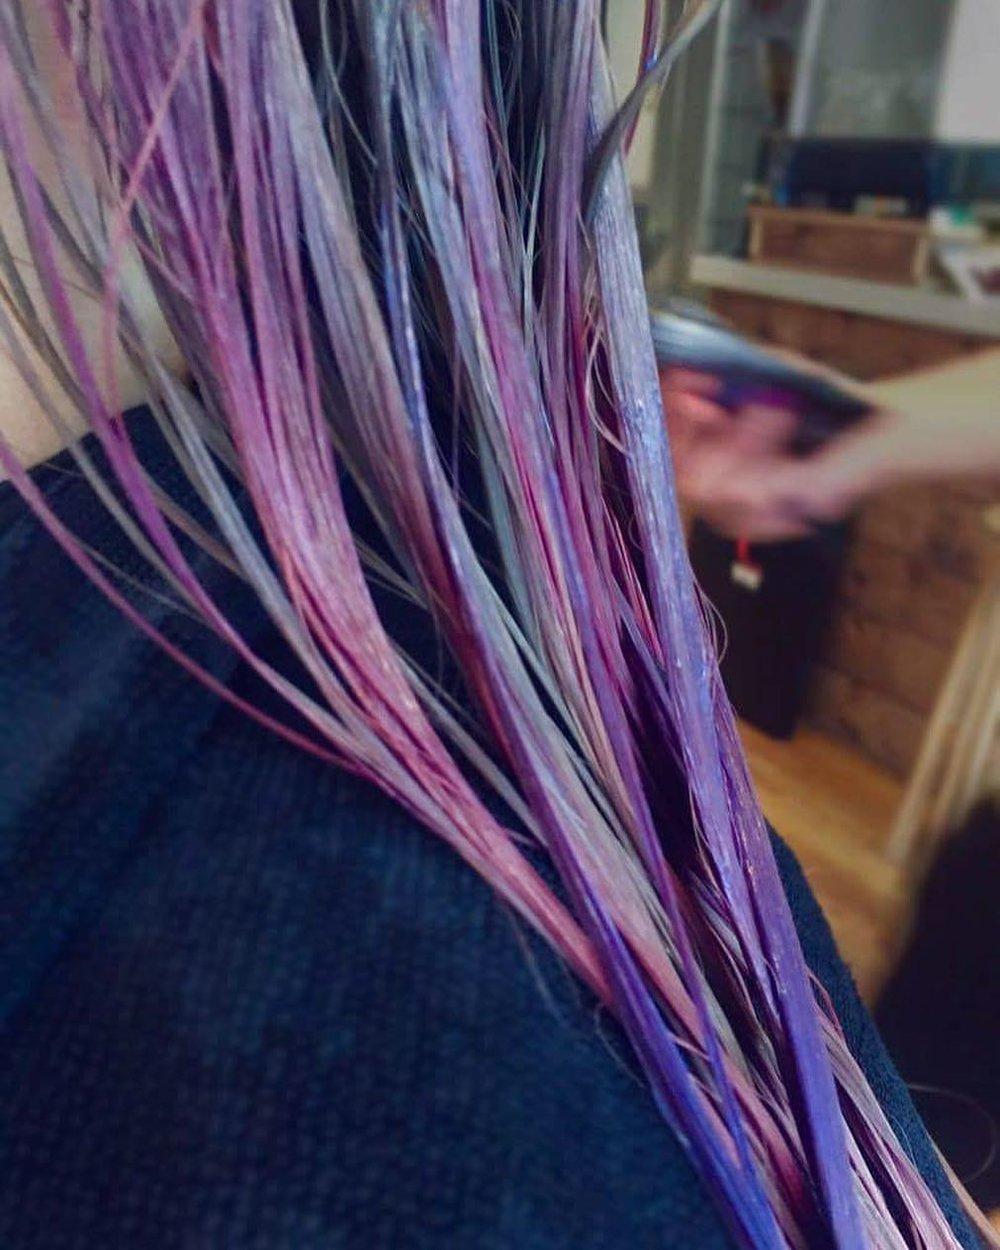 Hiring - Hair stylist / Colourist